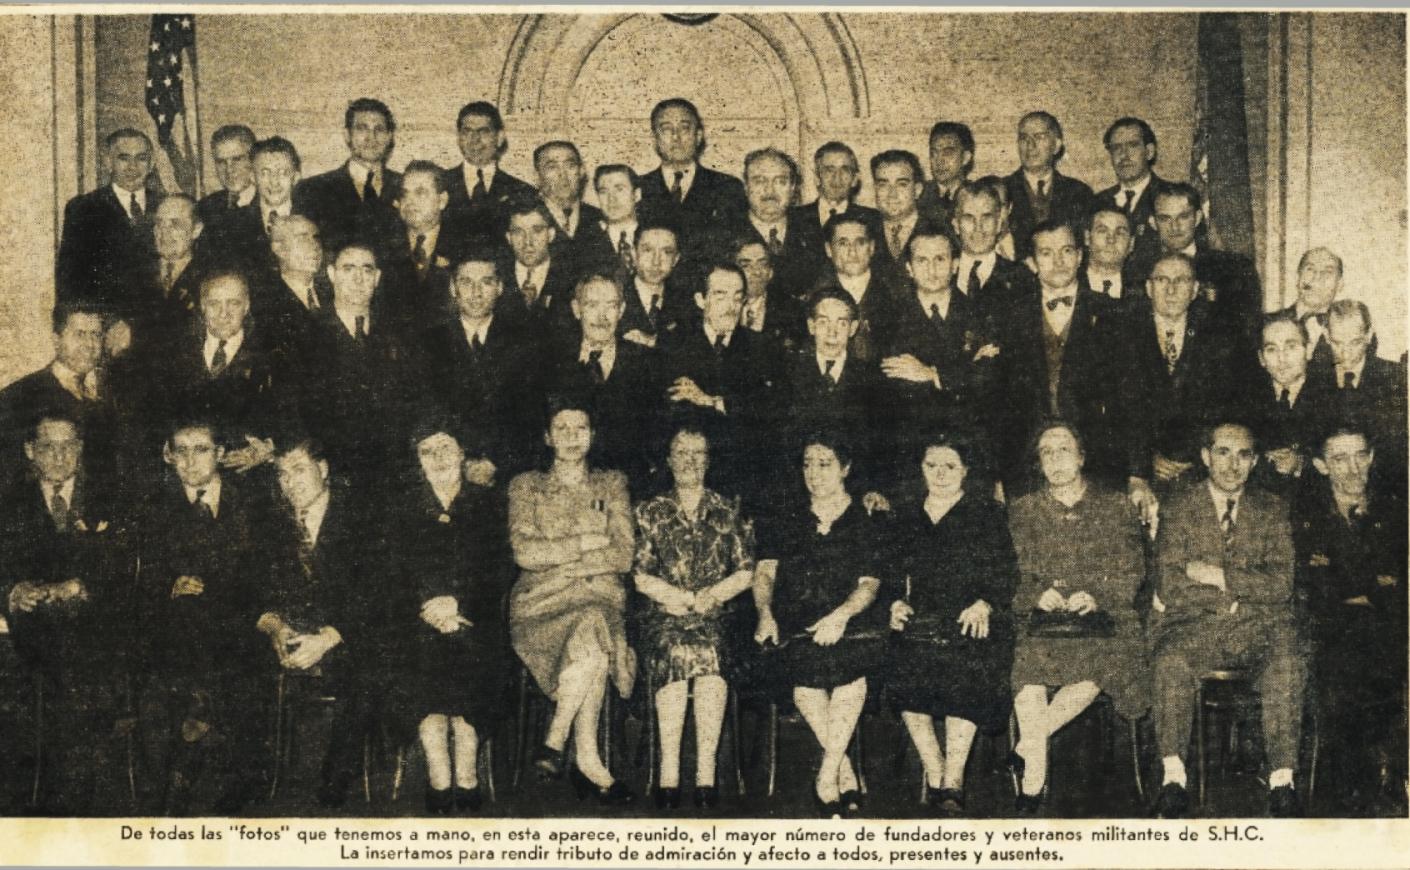 España Libre, Feb. 16, 1962:1. Founders' picture. From left to right: Jesús González Malo (11th first row); José Nieto Ruiz (4th second row); Félix Martí Ibáñez (8th second row); Aurelio Pego (5th top row).